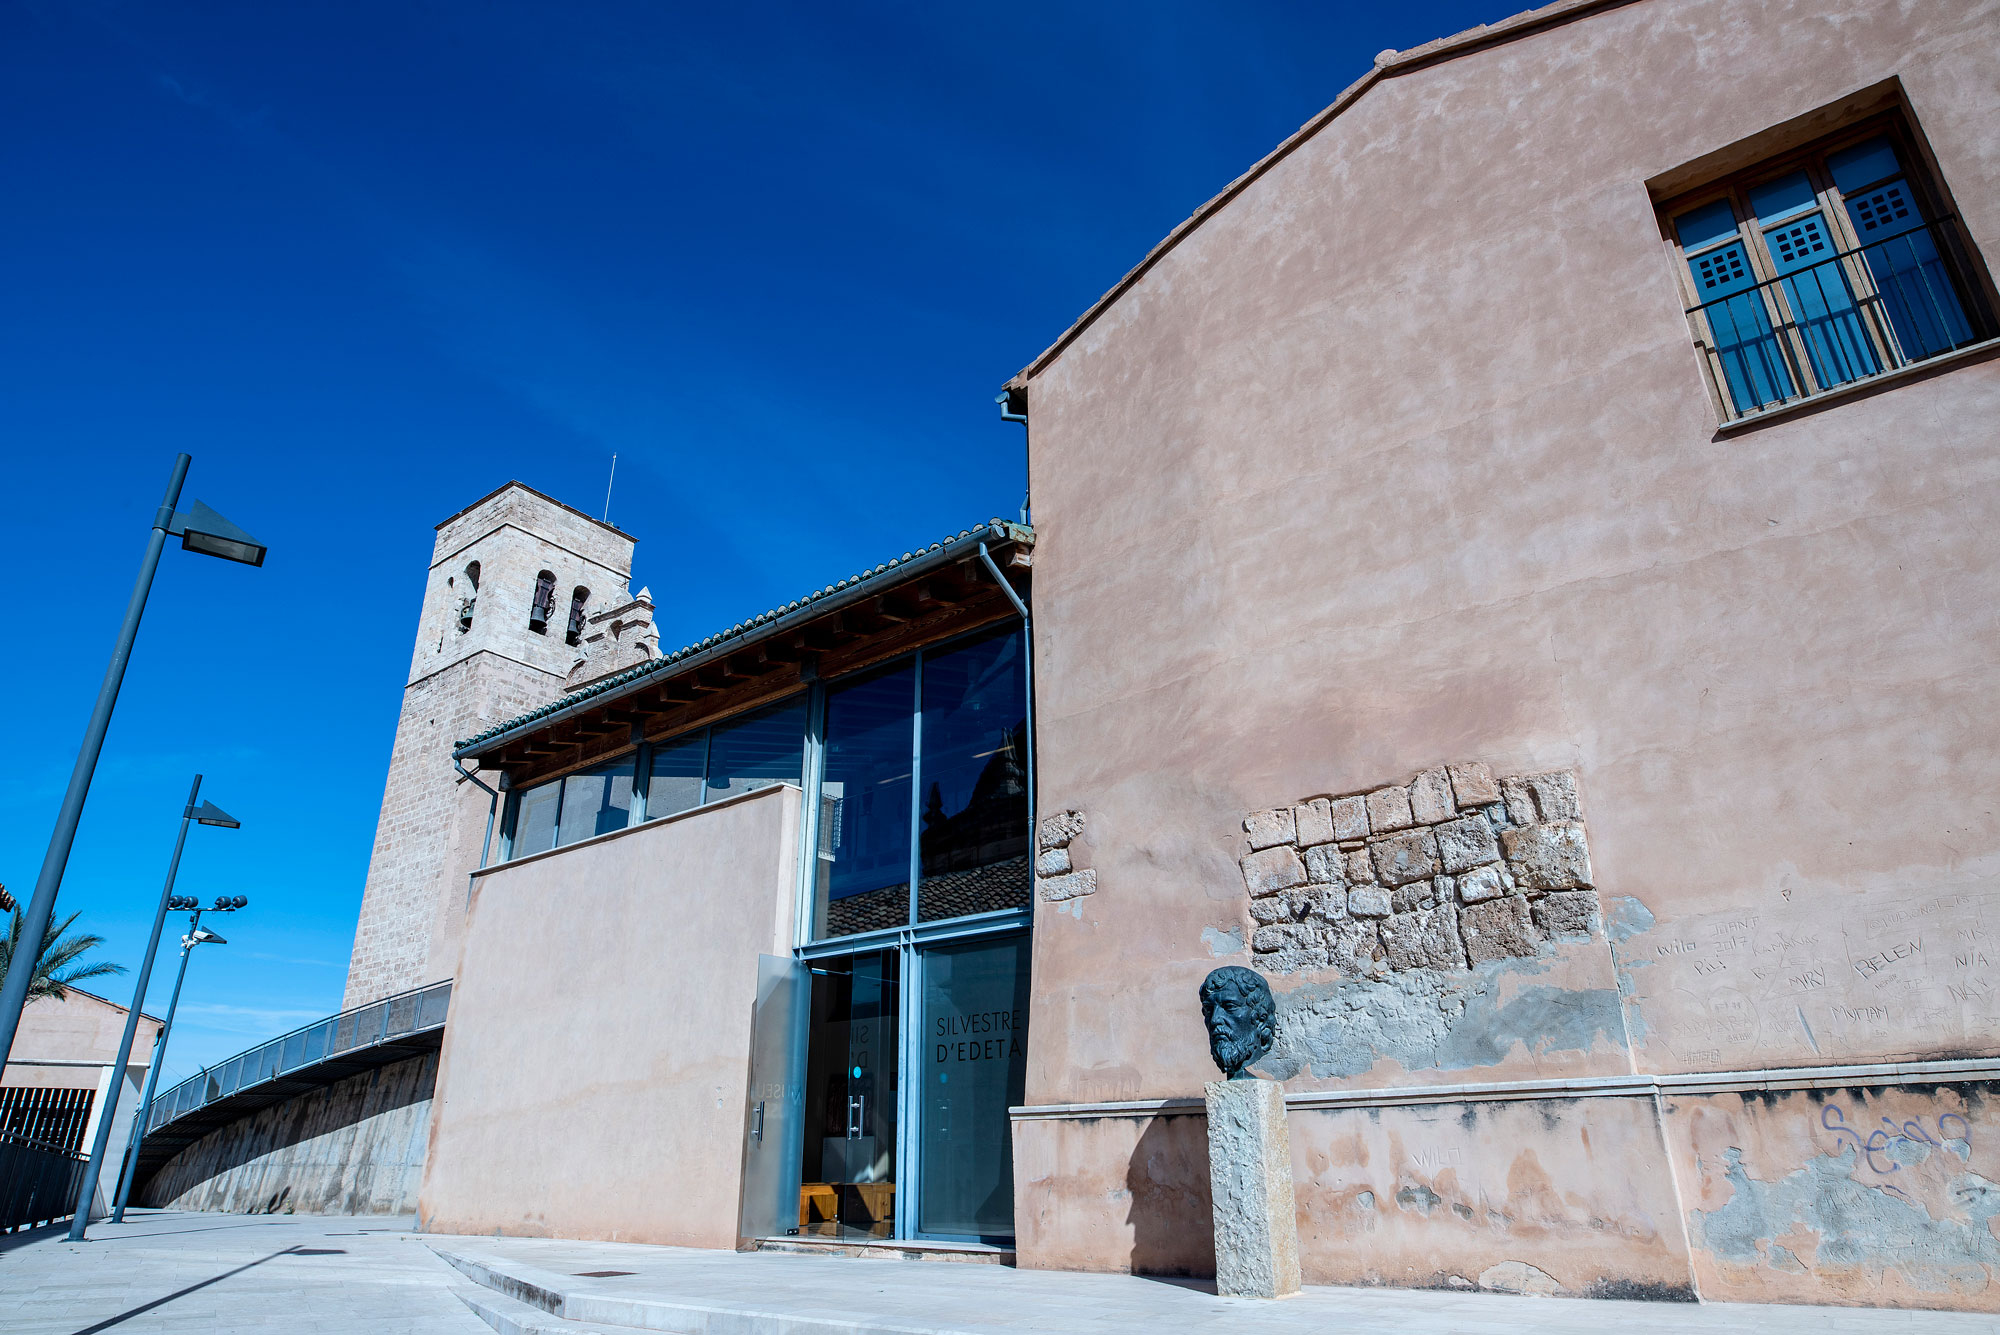 Turisme Lliria - Museu Silvestre d'Edeta